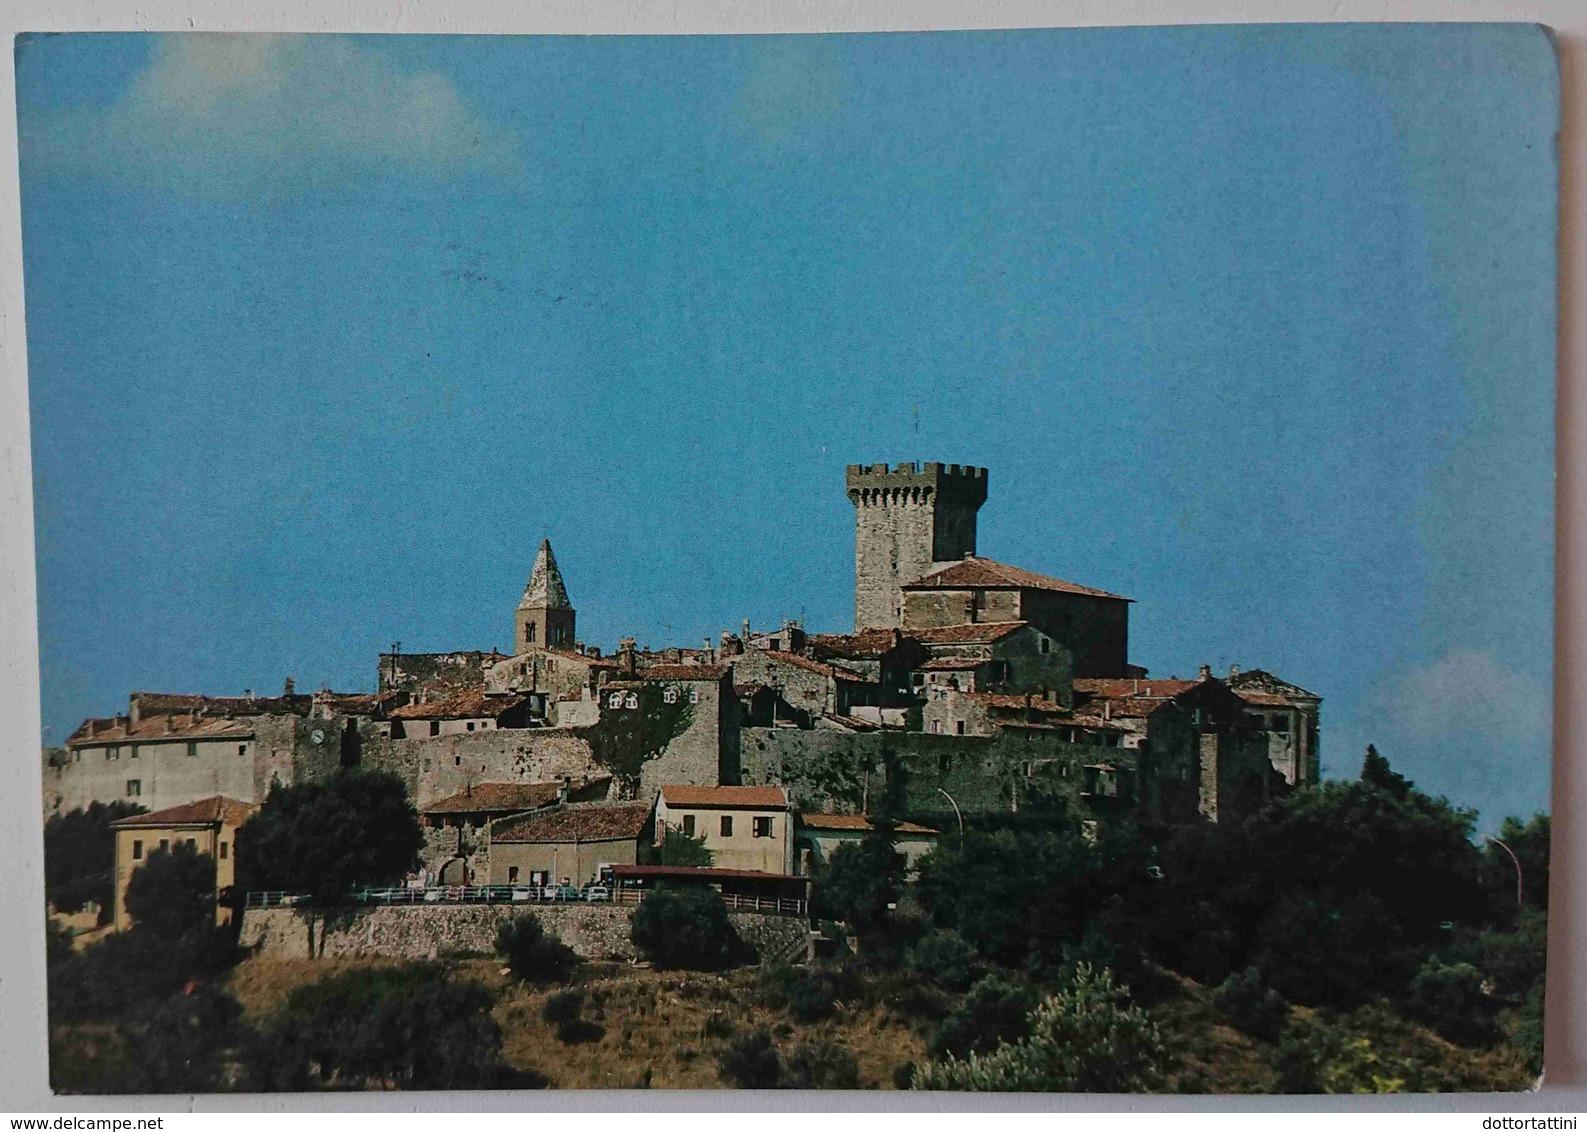 CAPALBIO (GROSSETO) - Panorama - Torre Del Castello - Vg   T3 - Grosseto